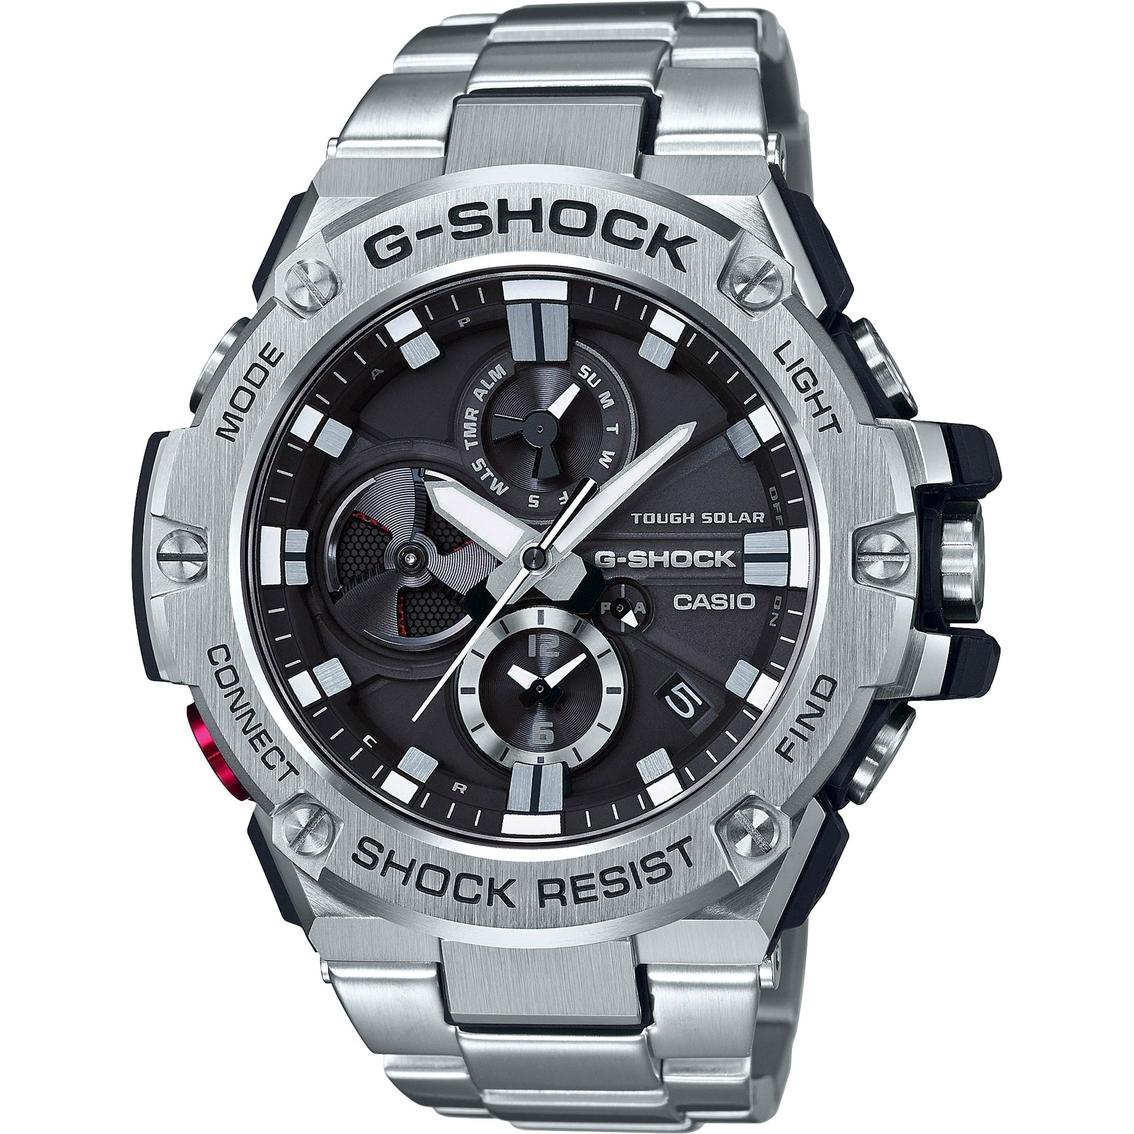 Casio Men S G Shock 200m Tough Sport Watch Gstb100d 1acr